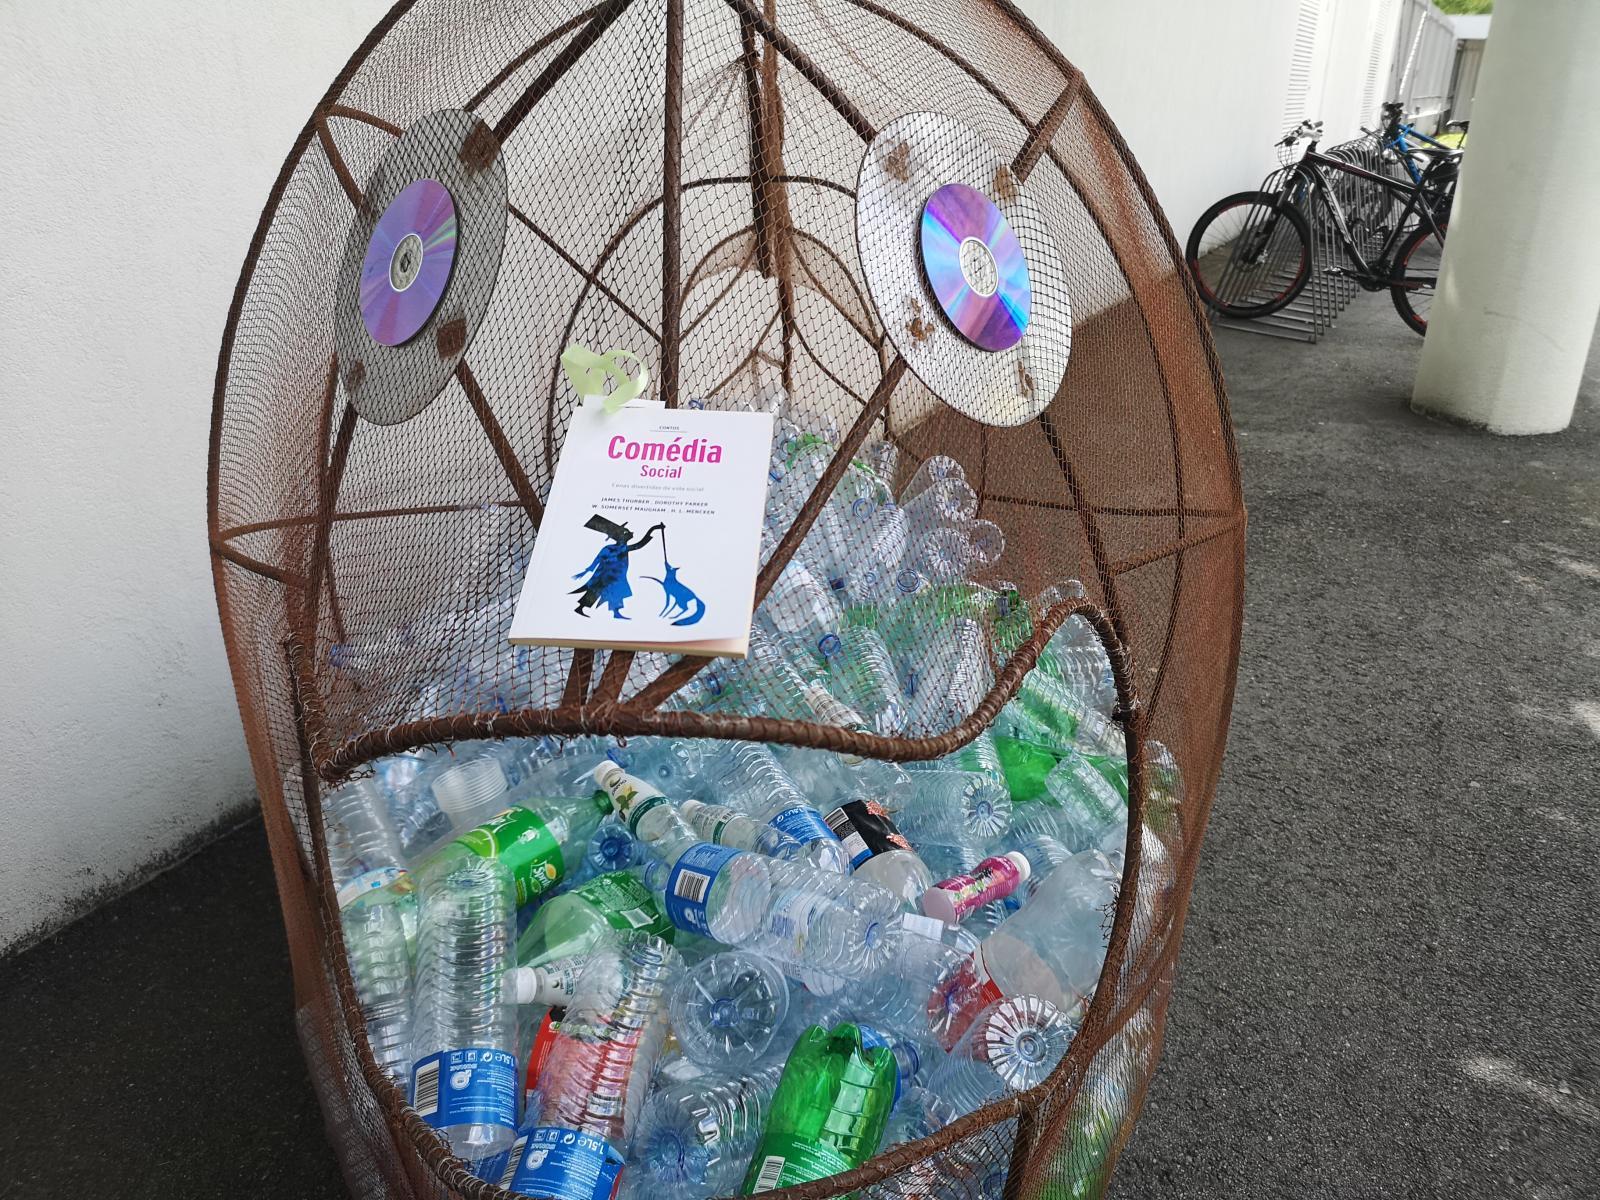 O Plástico: Reciclar e Renovar Mentalidades